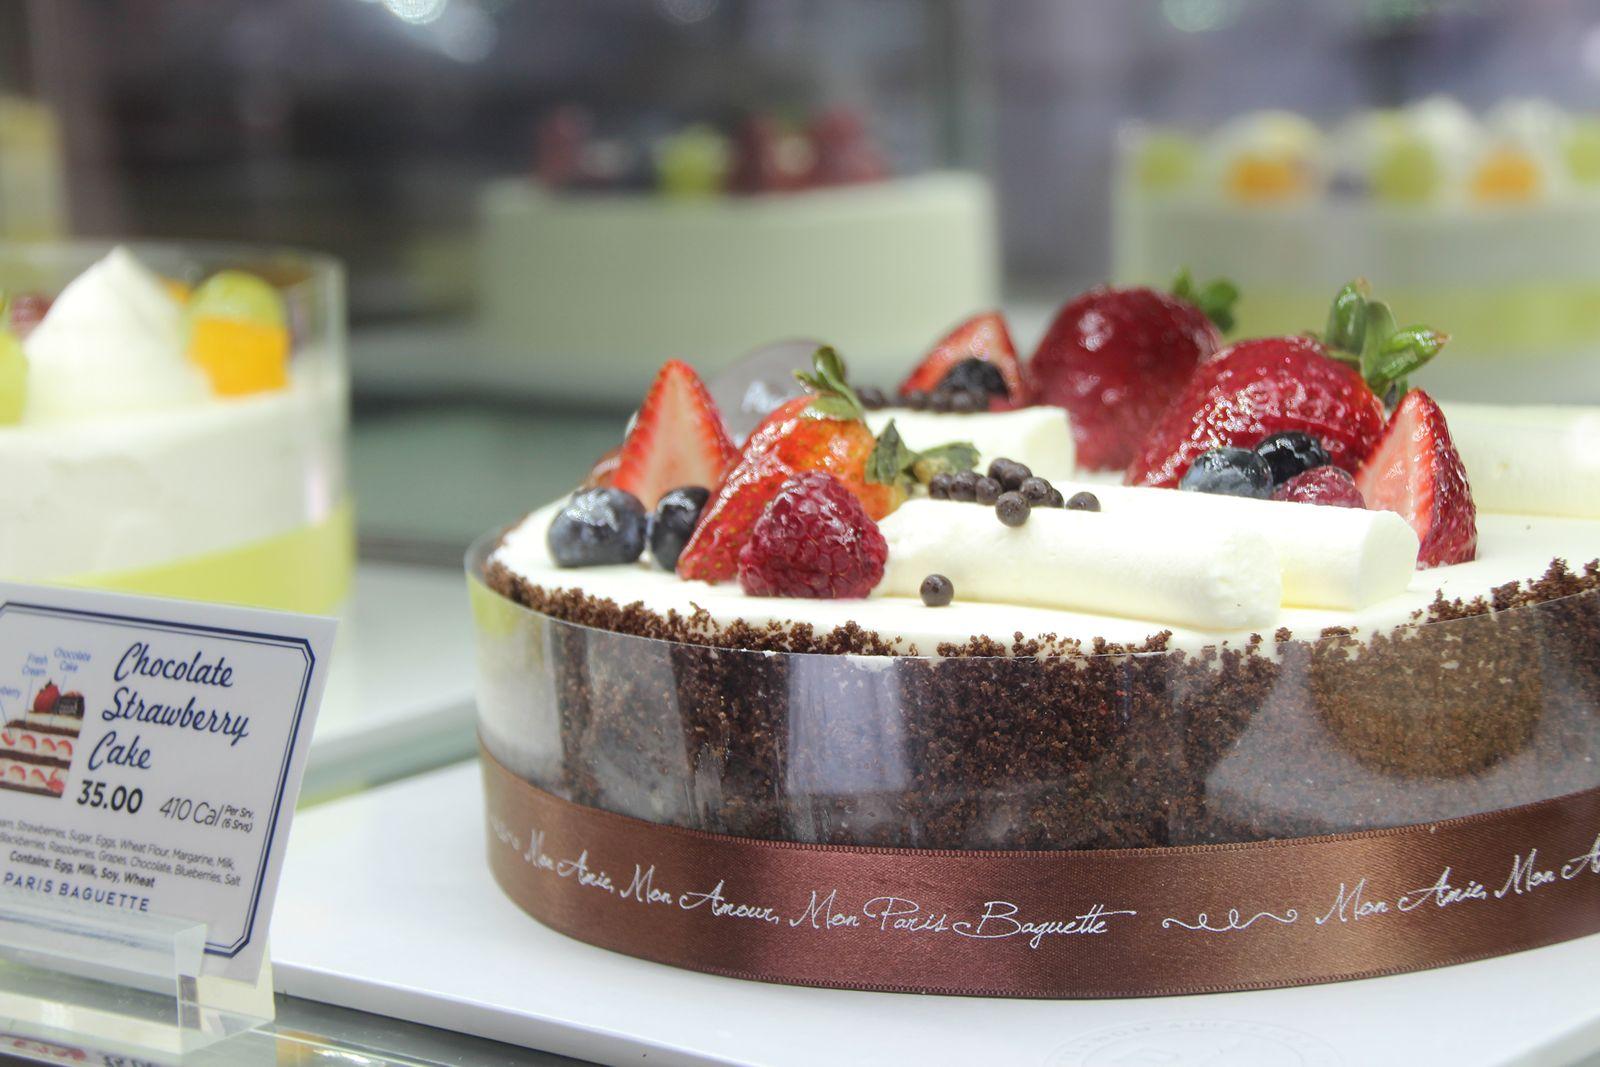 Paris Baguette, La Habra Grand Opening - Flor and Jae bring Parisian treats to La Habra